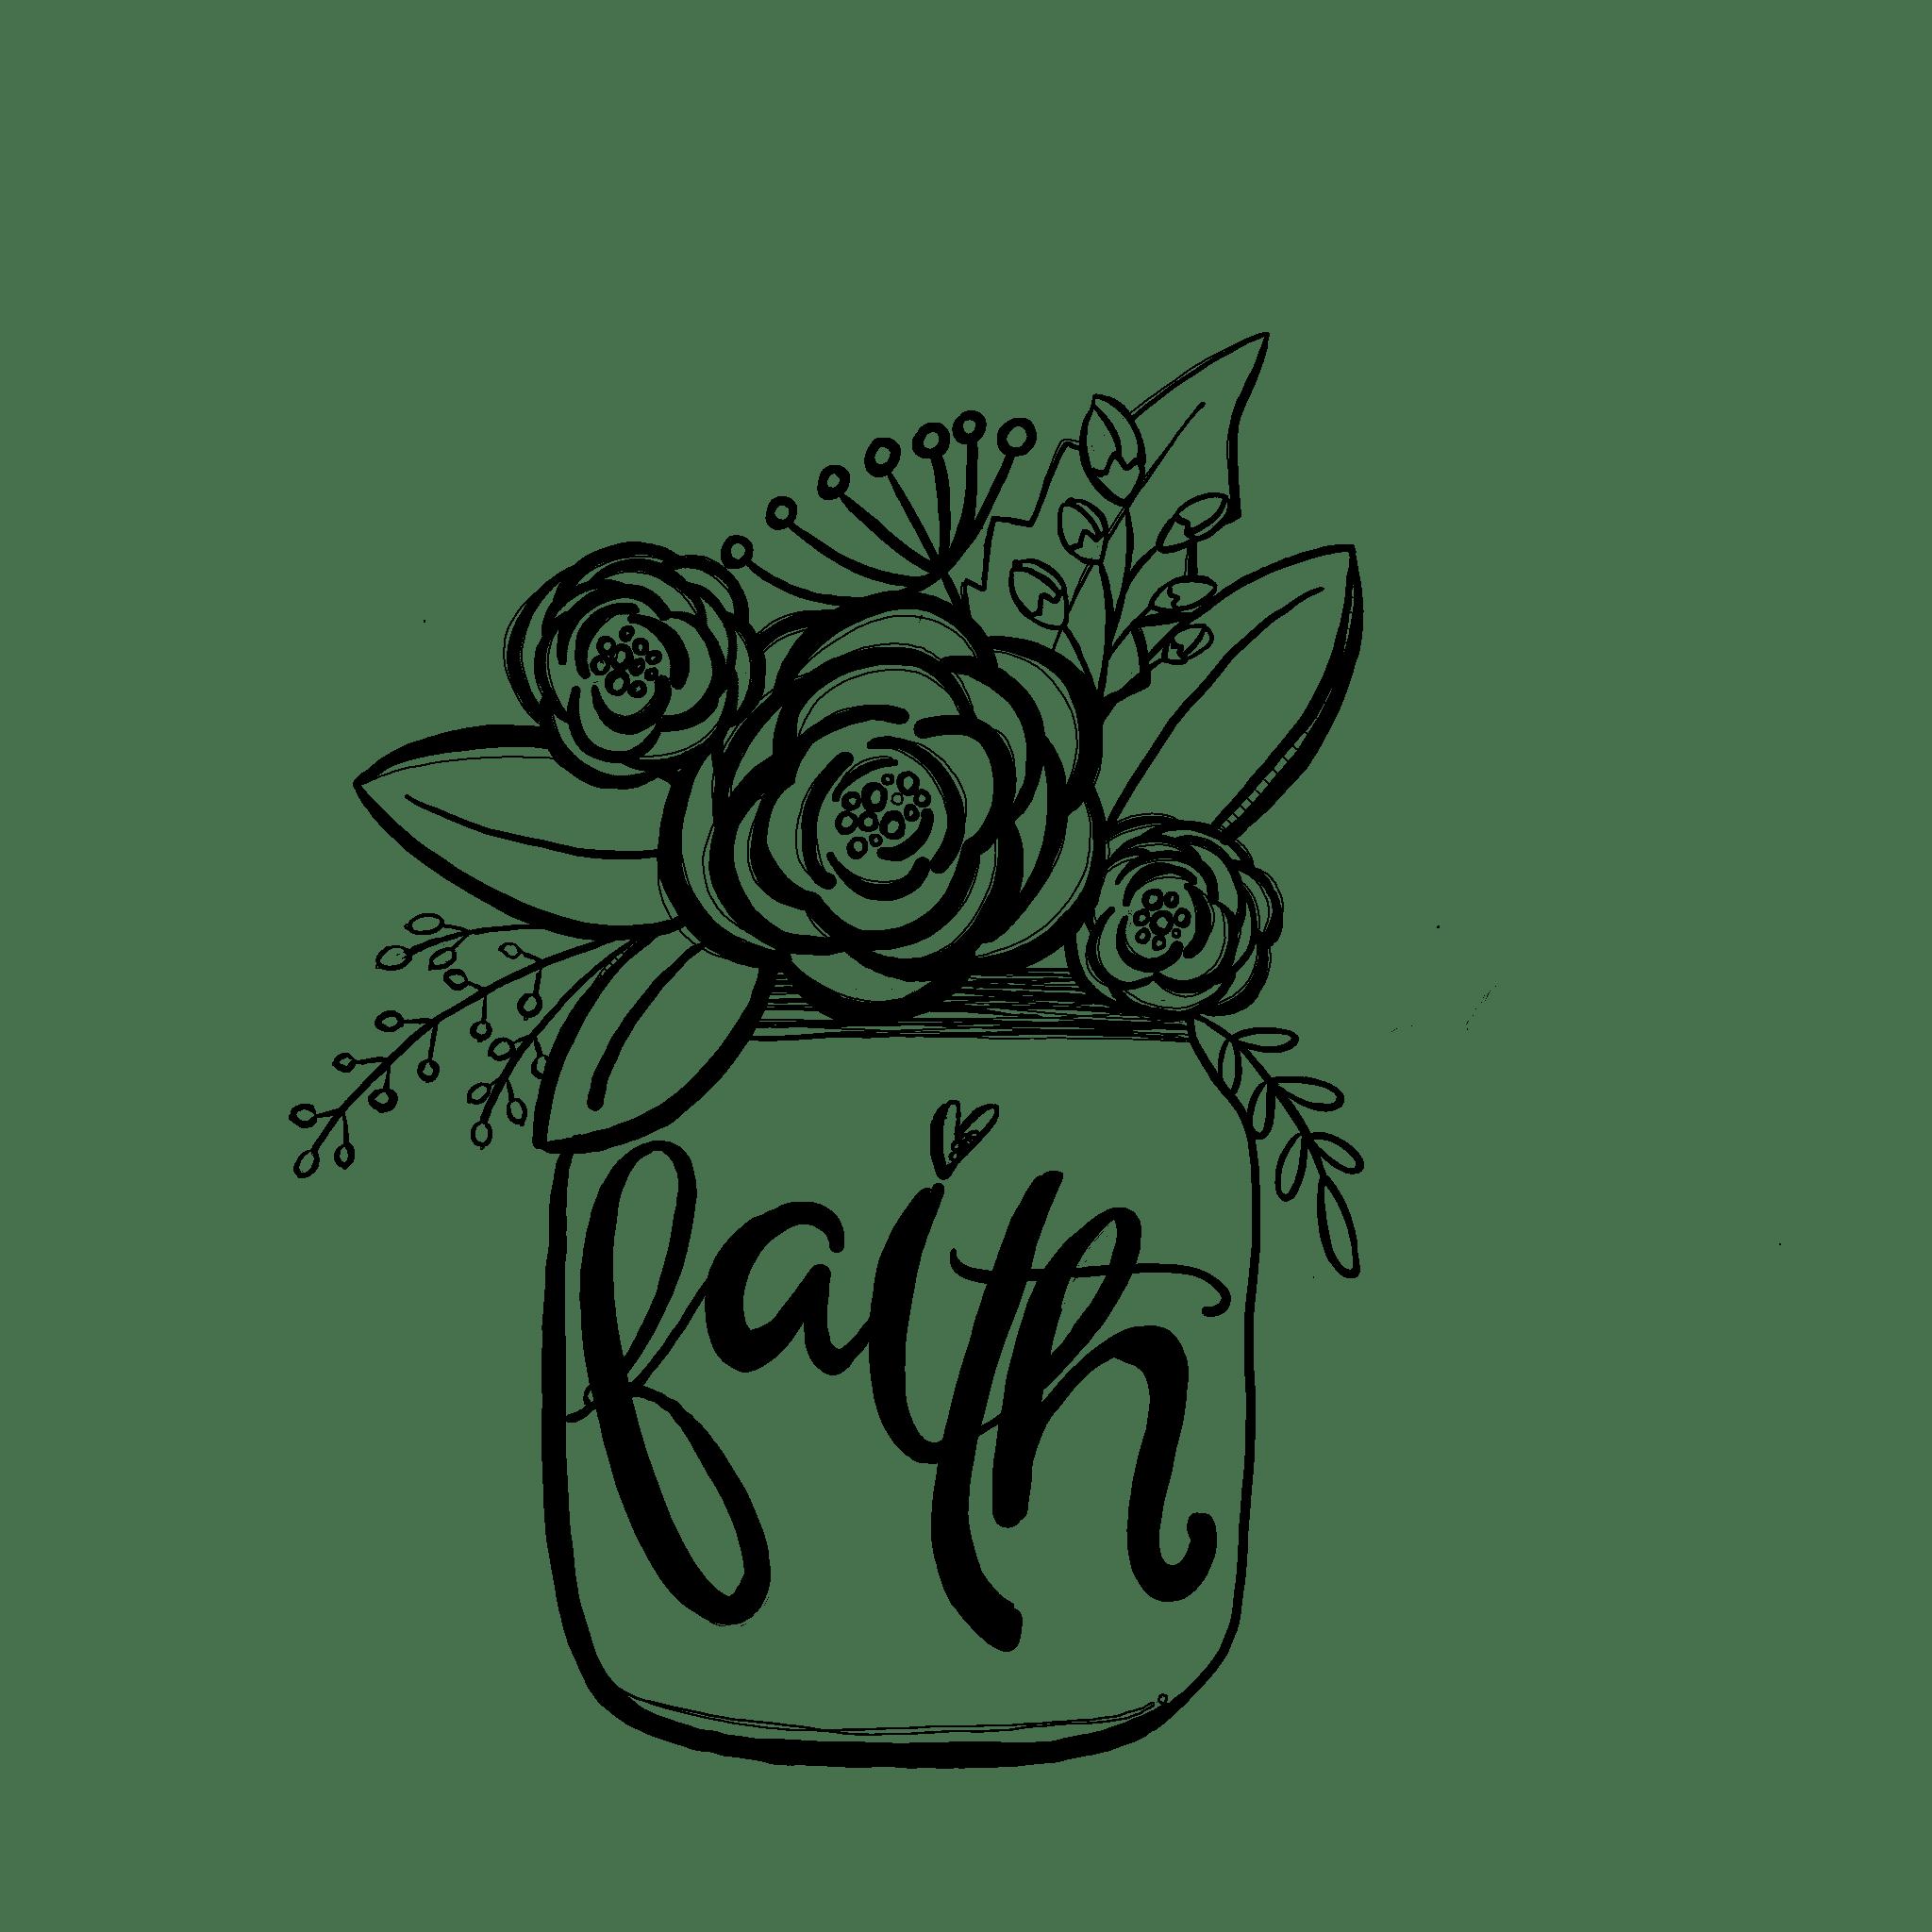 clip free download Doodle